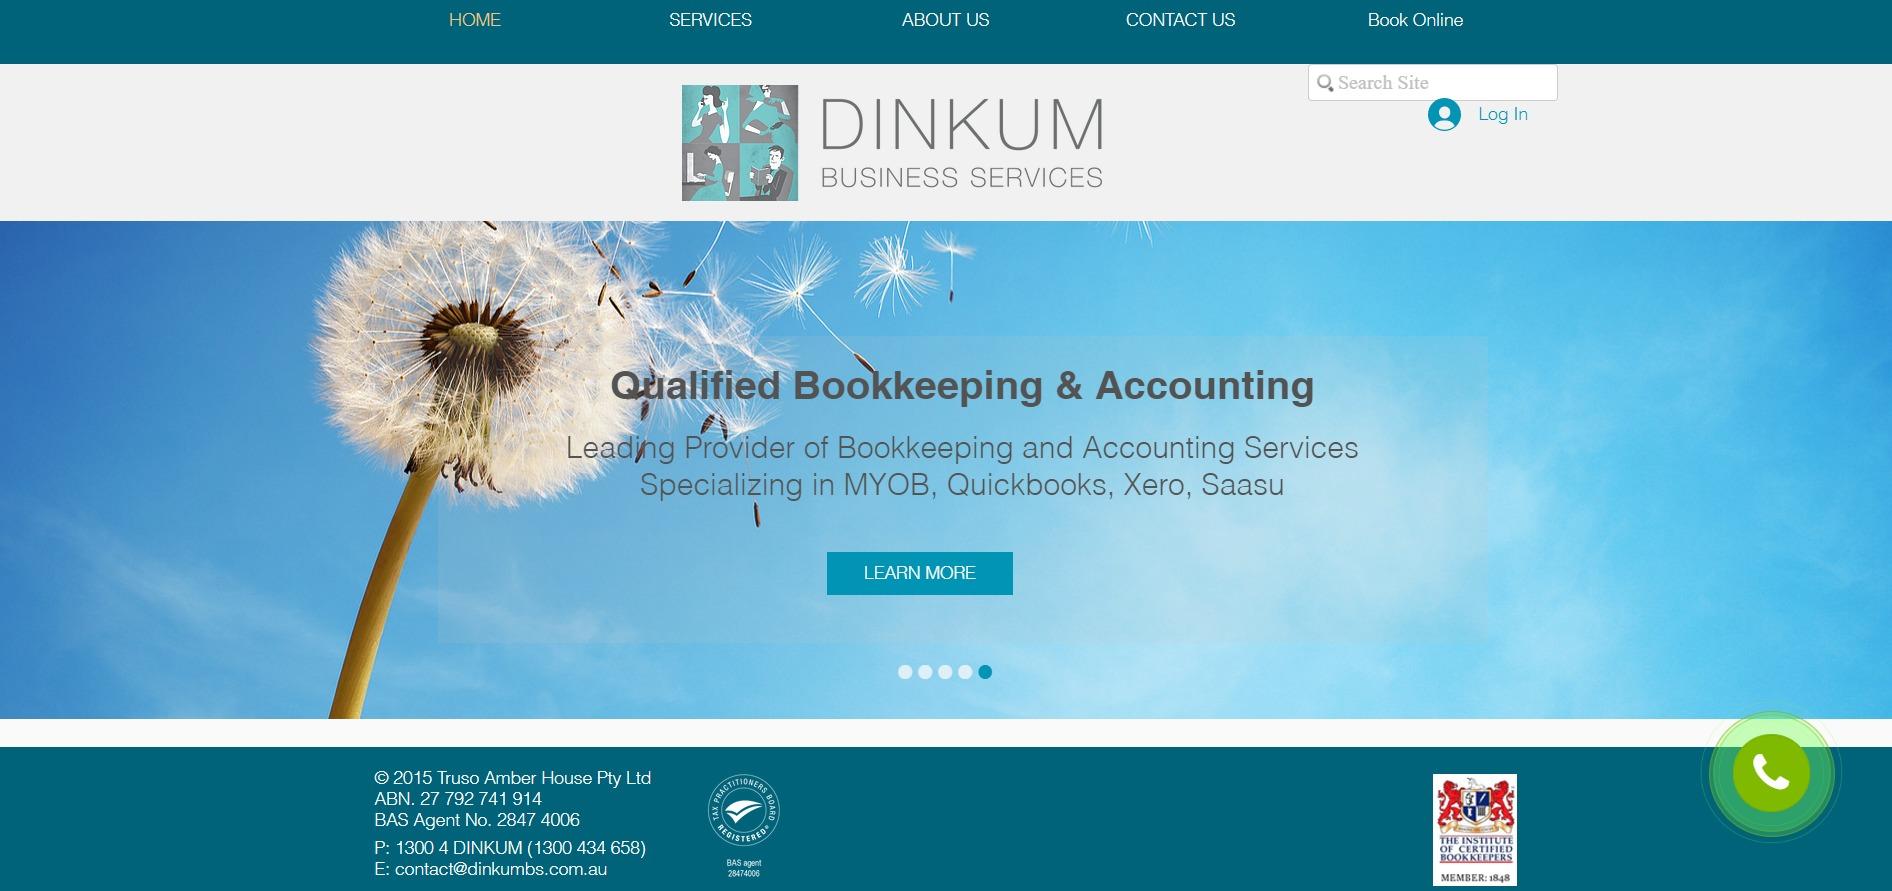 Dinkum Business Services